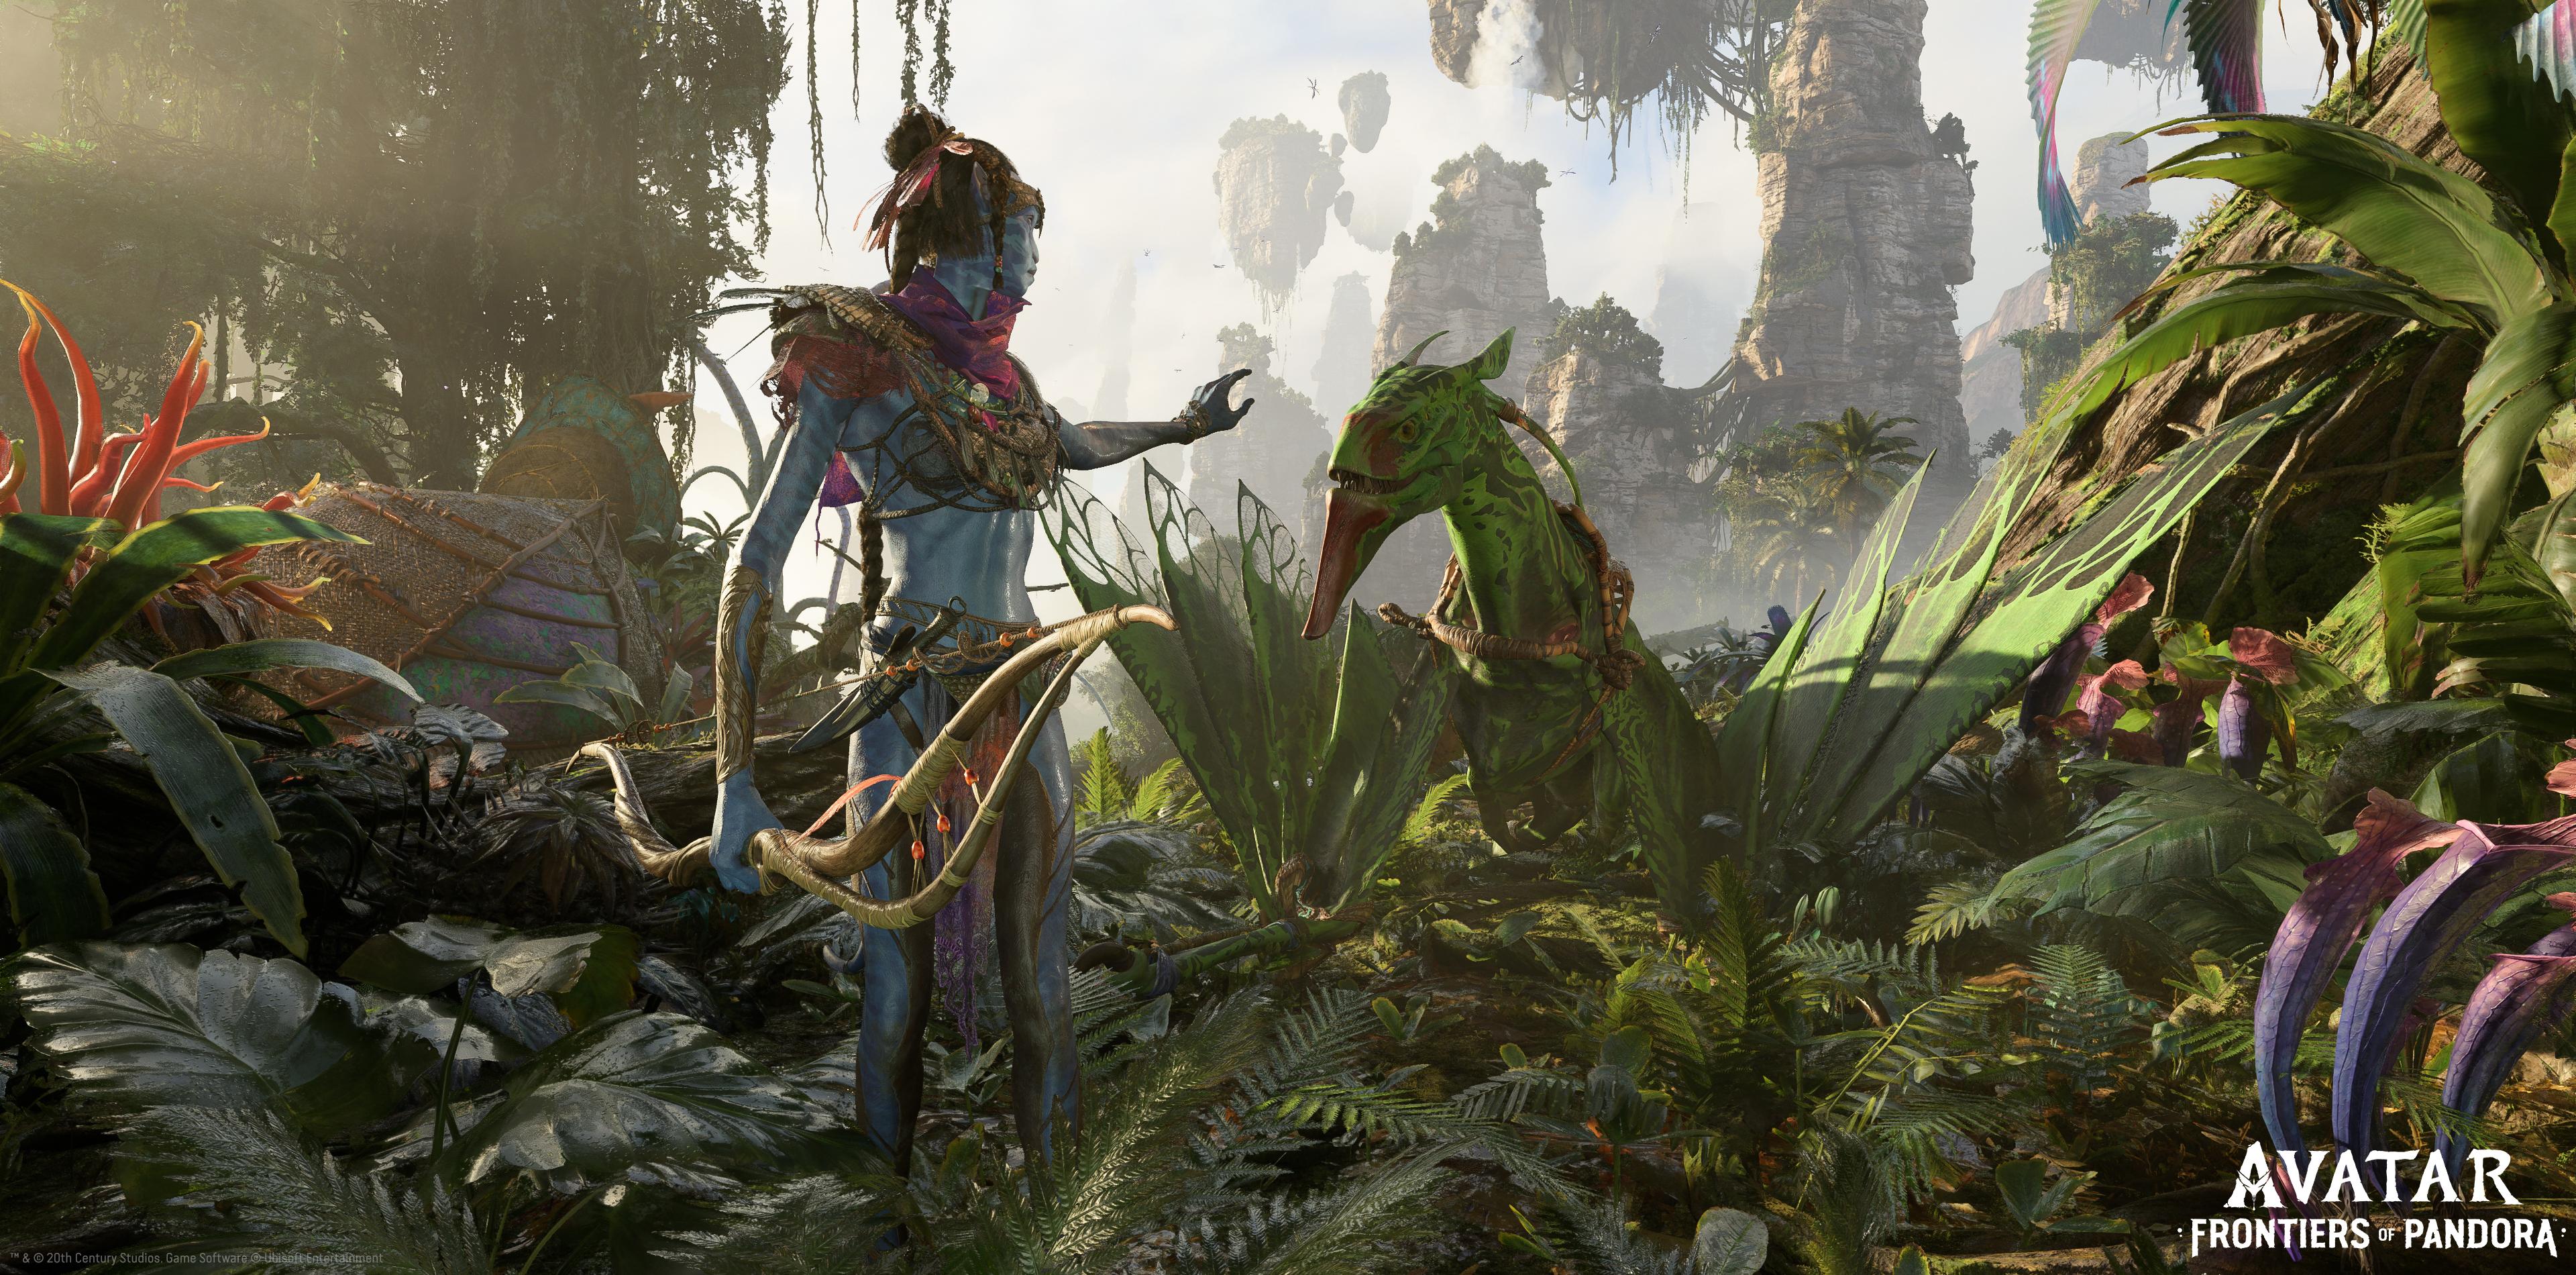 A female Na'vi reaches out toward a reptile creature.